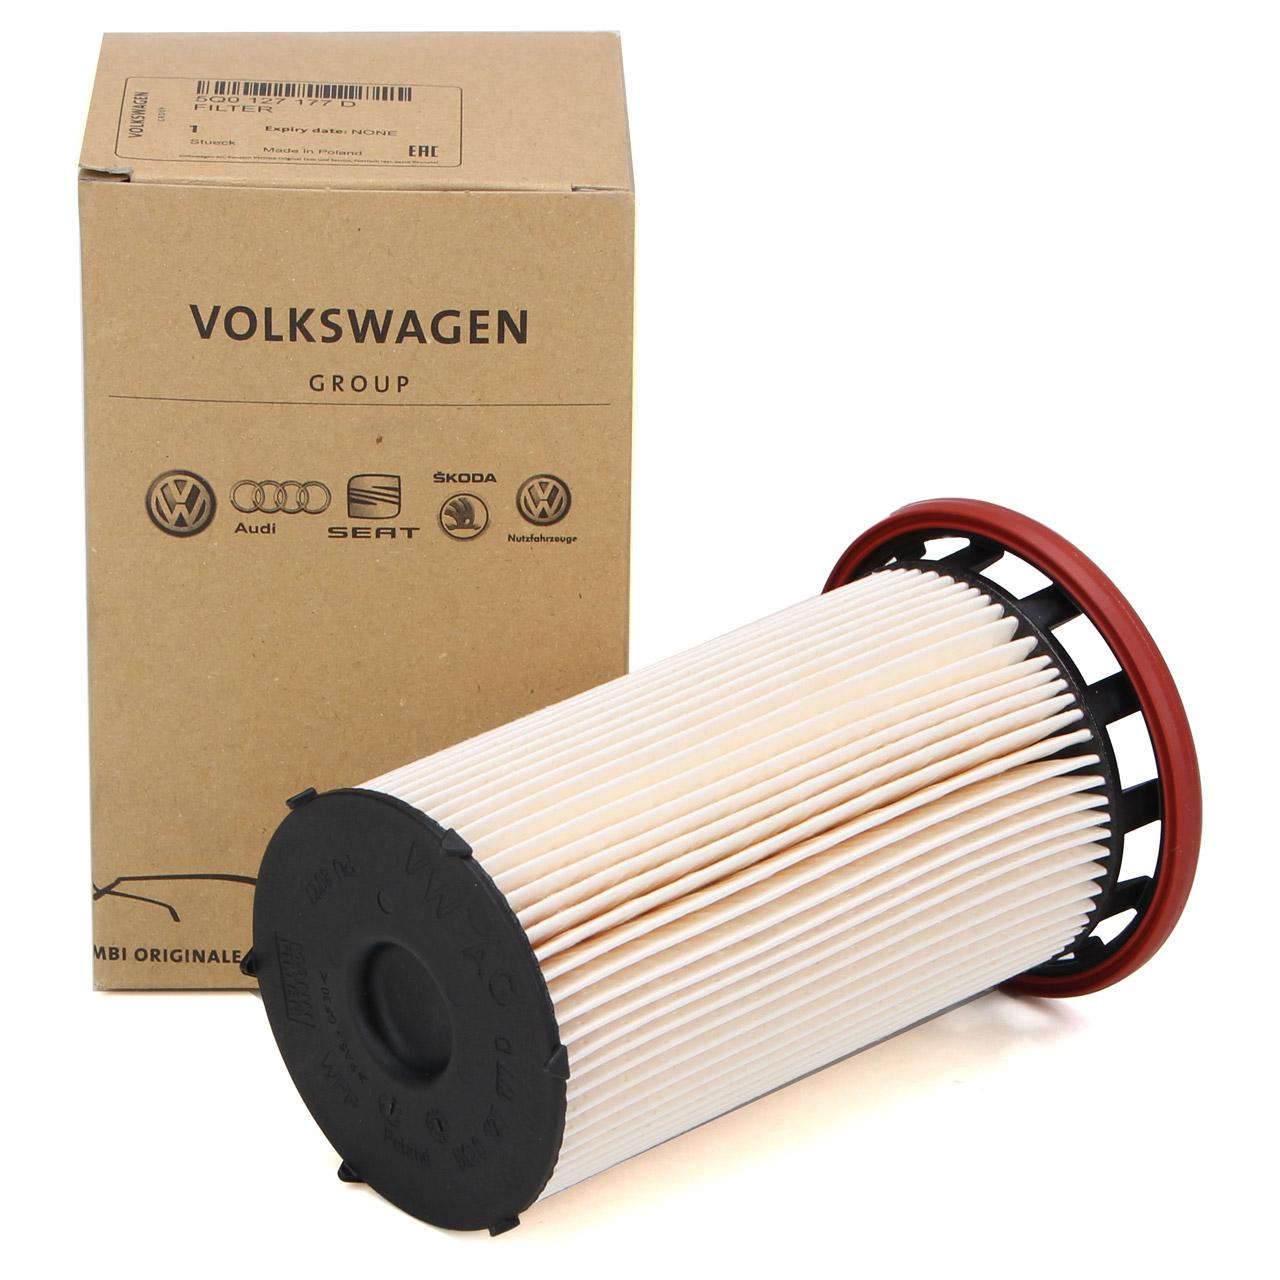 ORIGINAL Audi Skoda VW Kraftstofffilter Dieselfilter 1.6/2.0 TDI 5Q0127177D